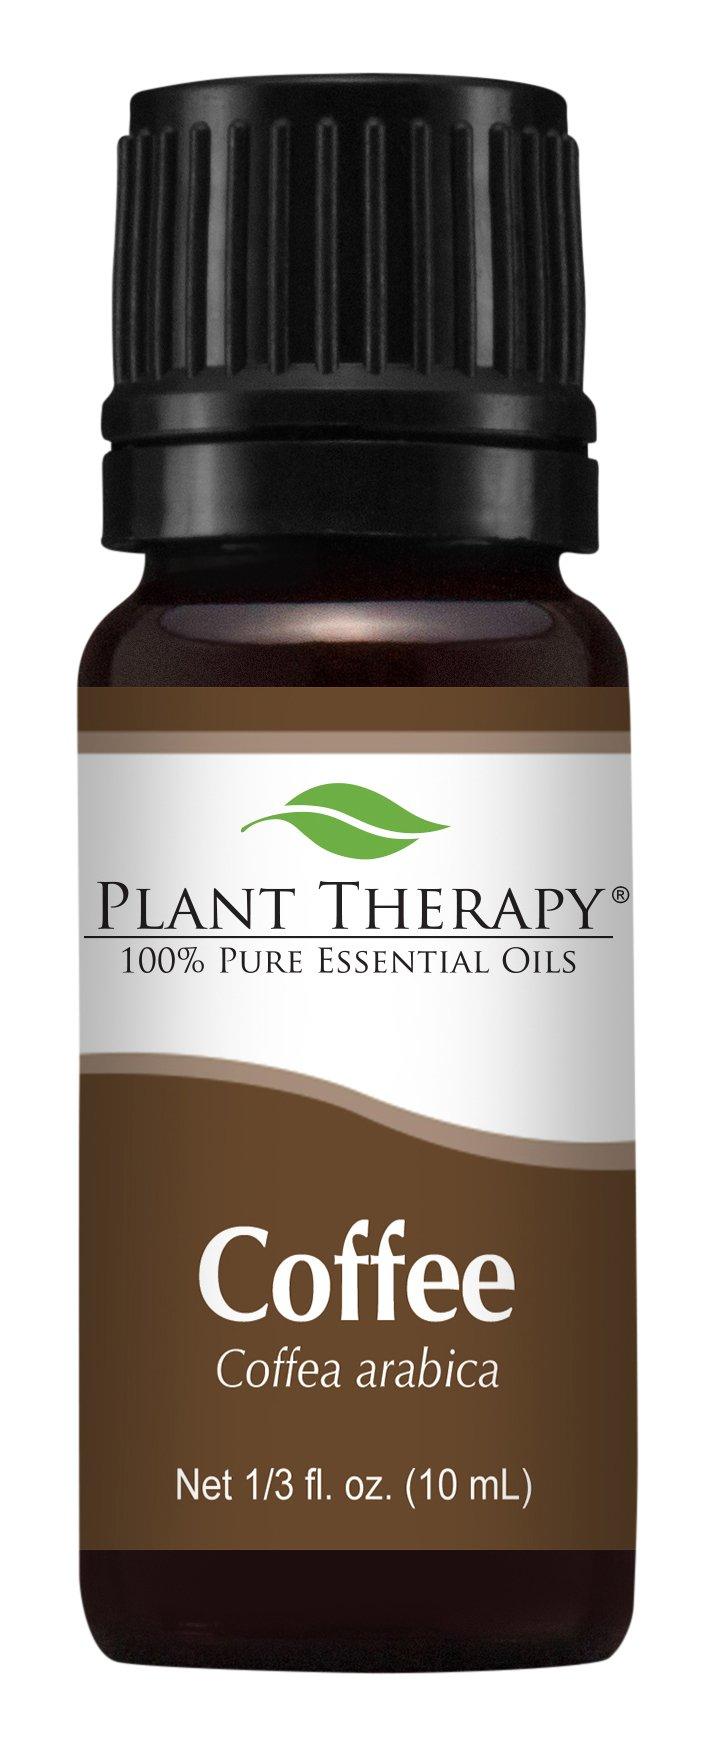 Plant Therapy Coffee Essential Oil. 100% Pure, Undiluted, Therapeutic Grade. 10 ml (1/3 oz).